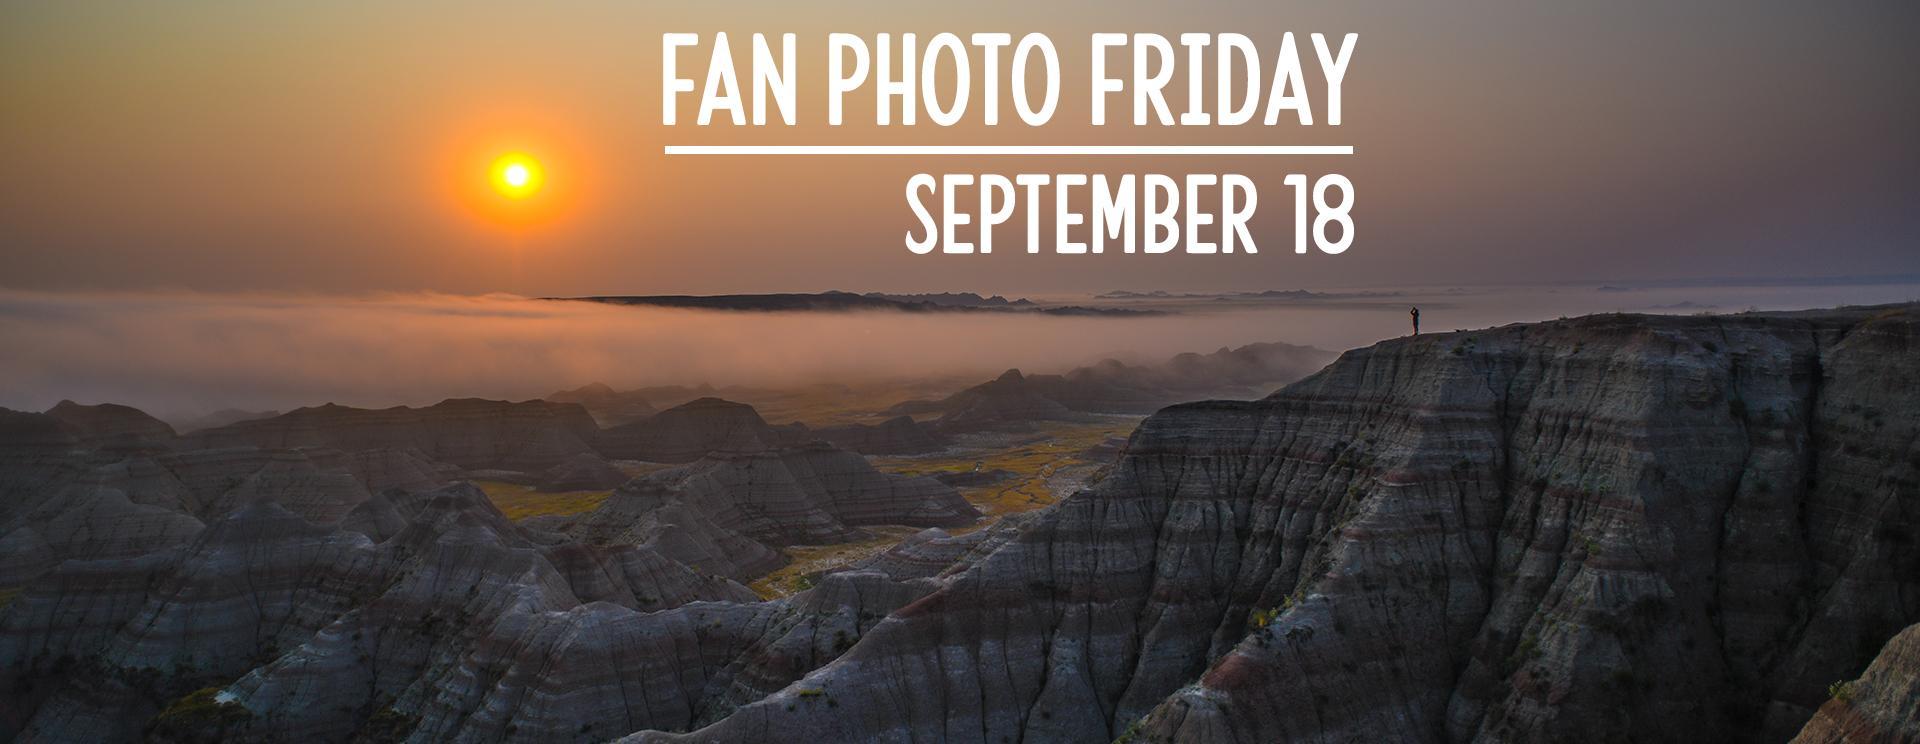 Fan Photo Friday | September 18, 2020